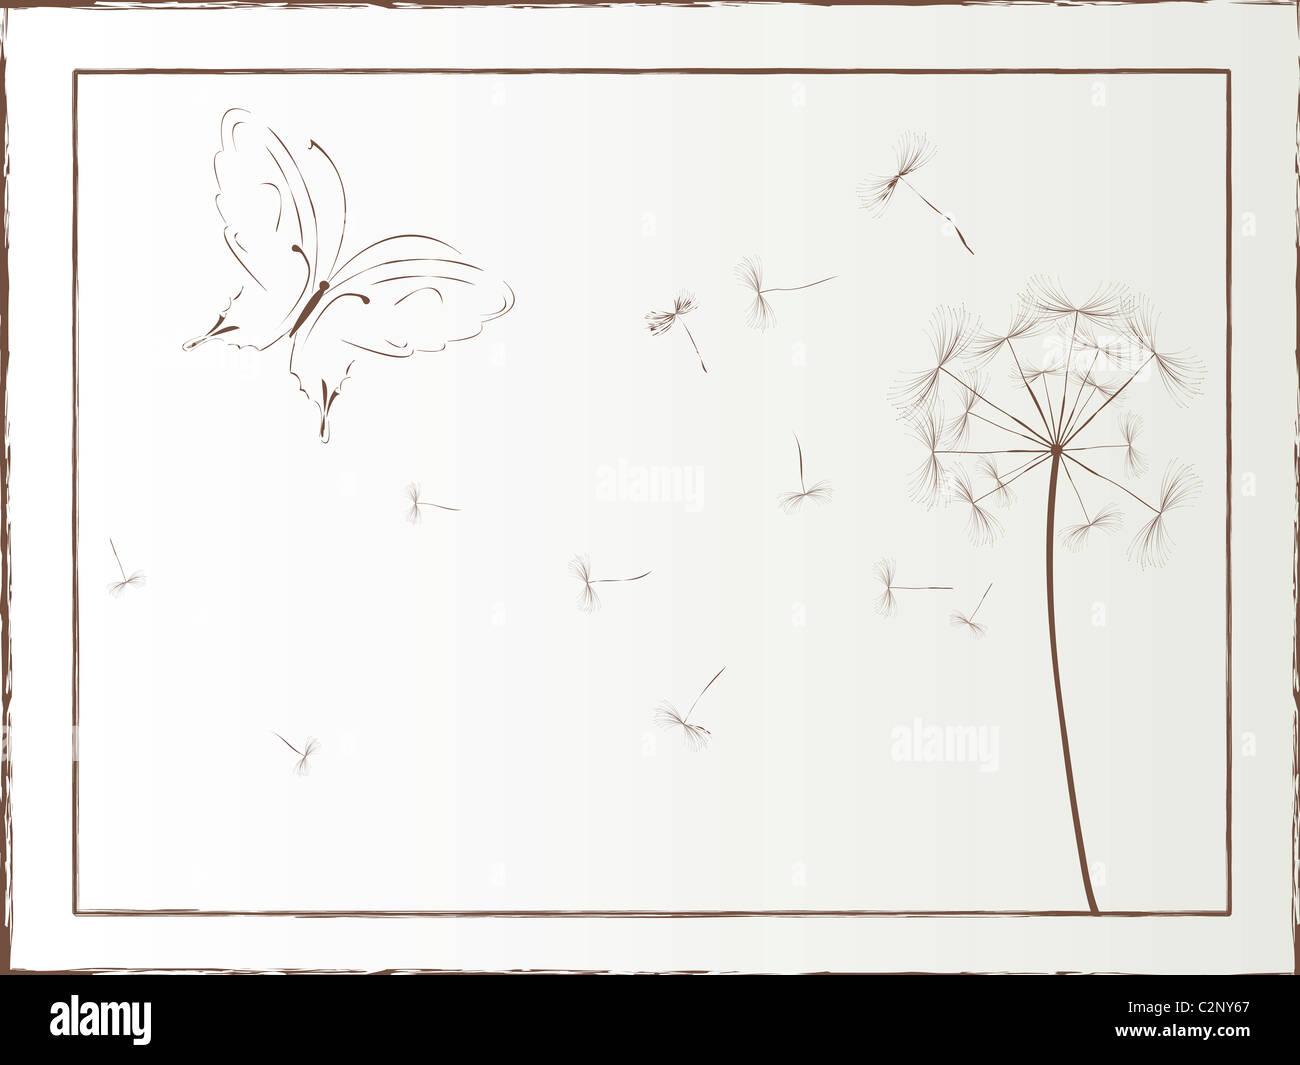 Dandelion and butterfly framed illustration - Stock Image